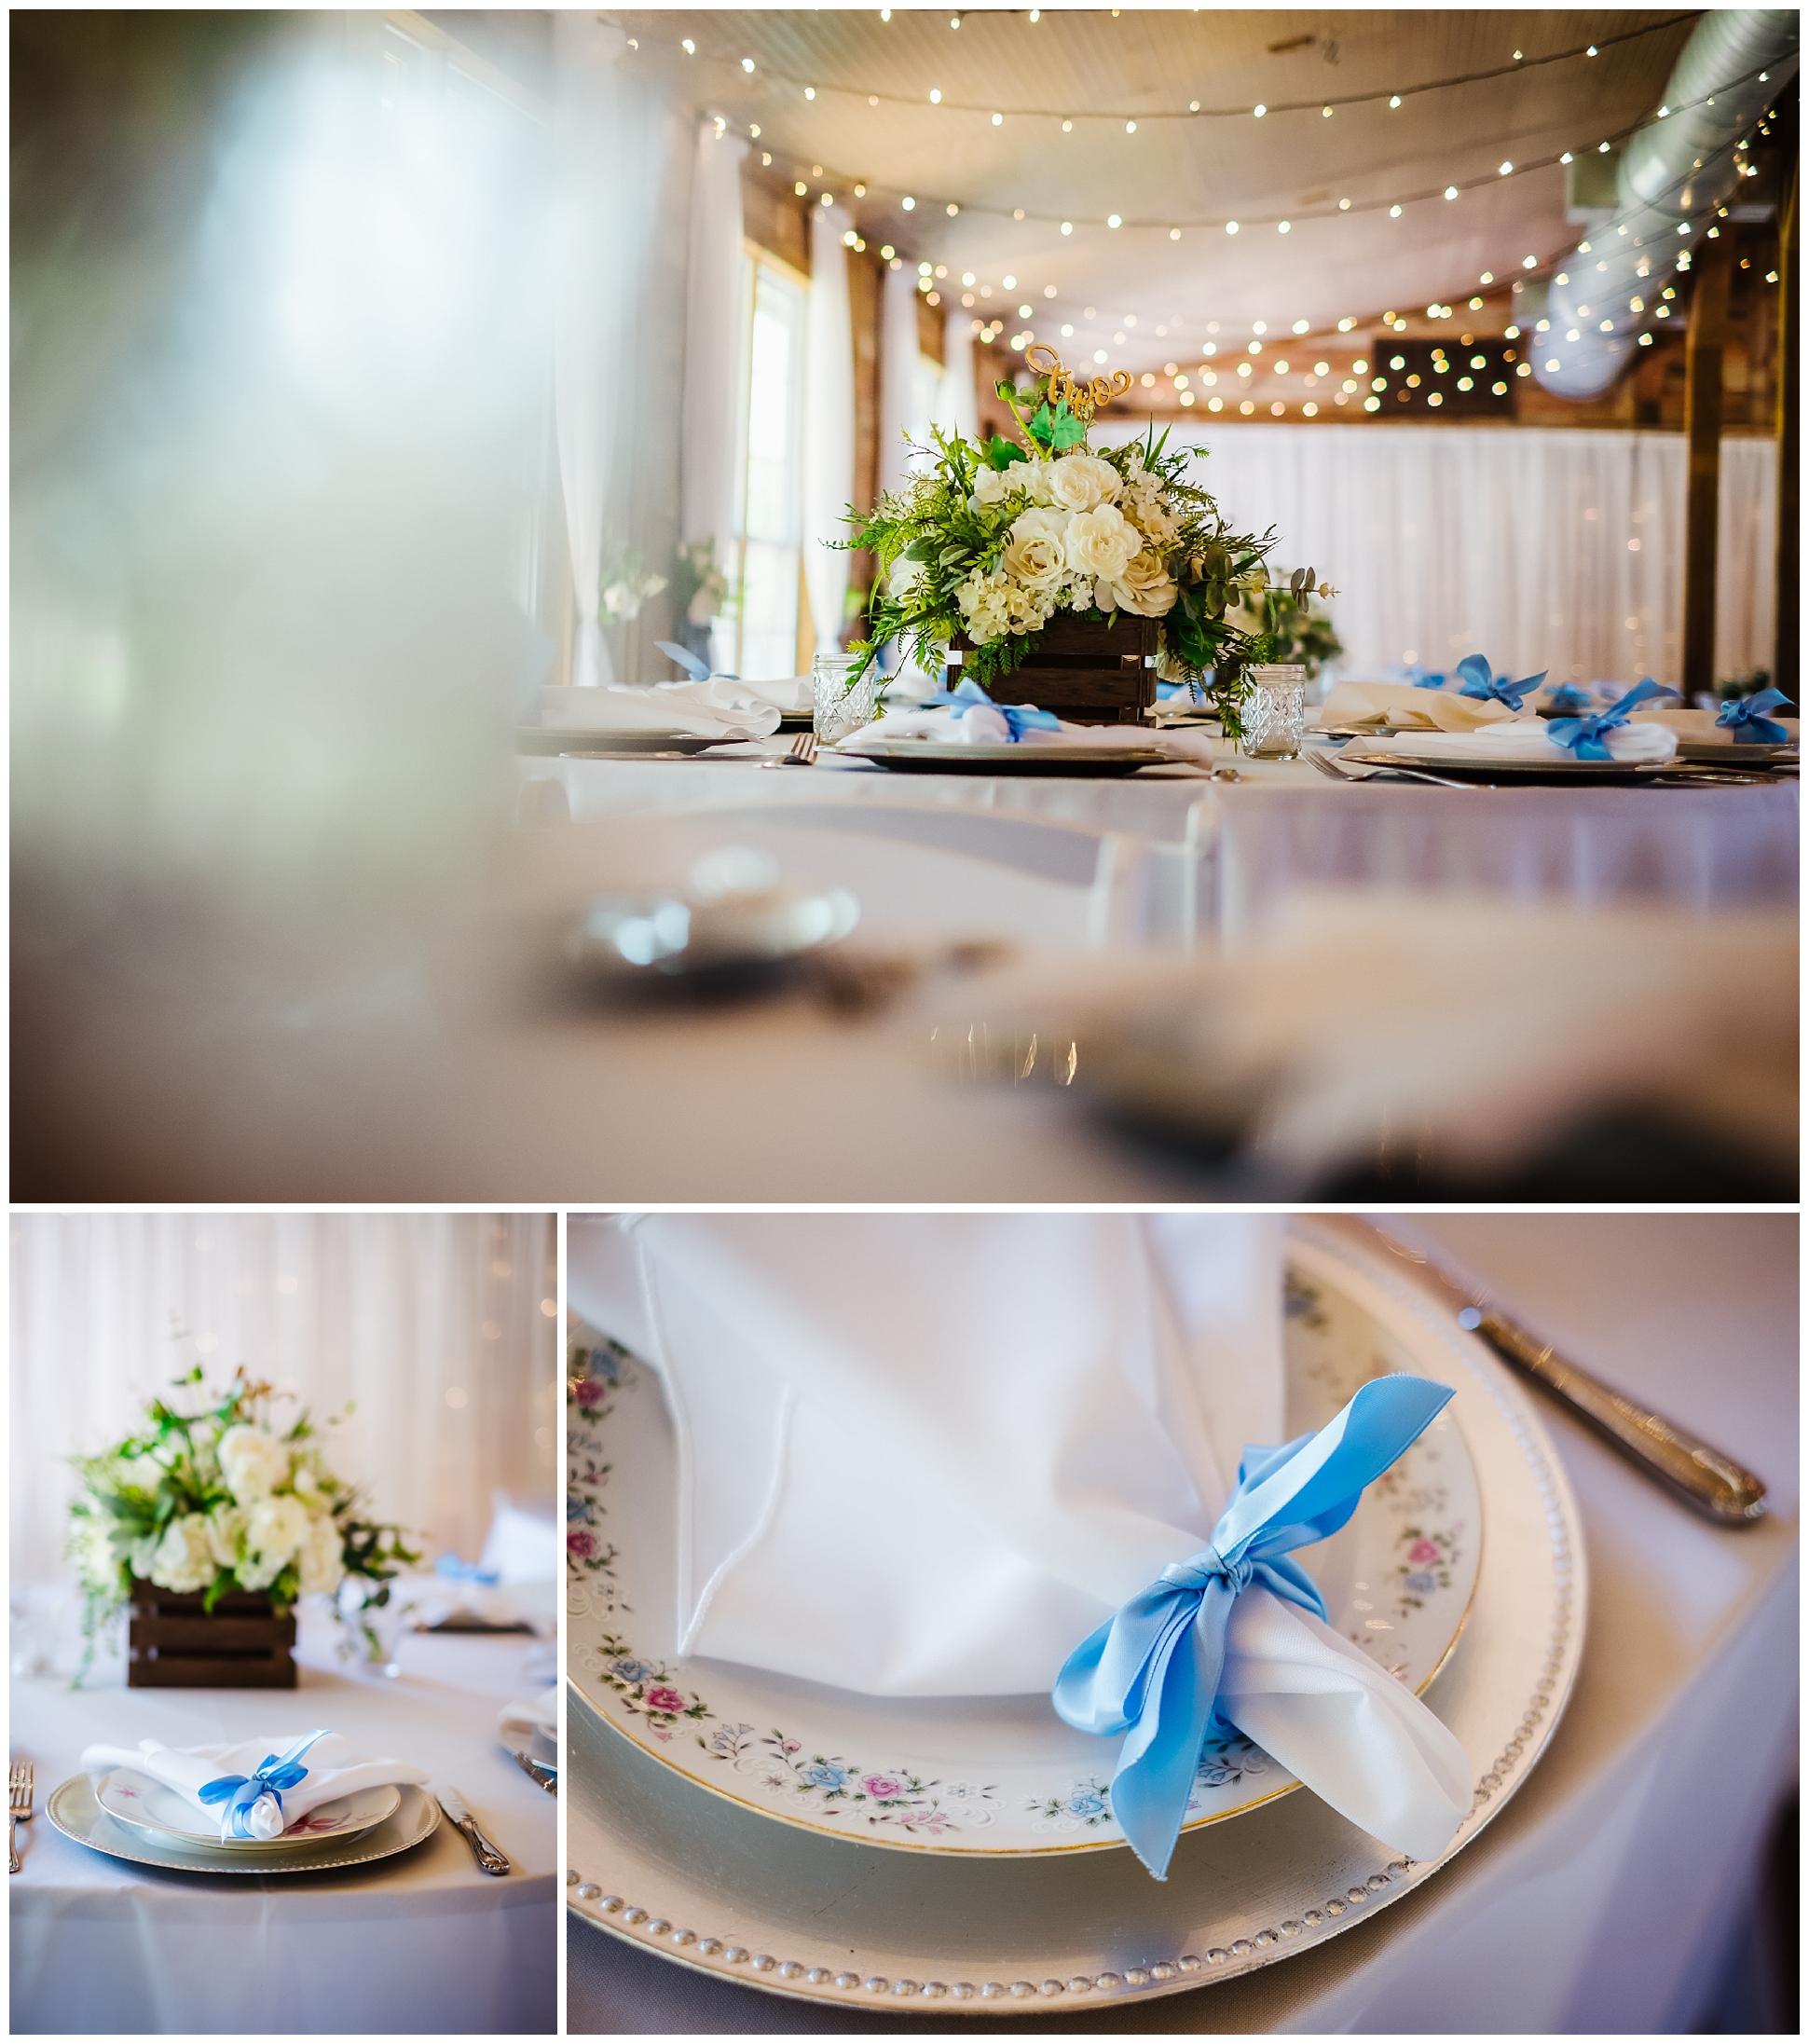 cross-creek-ranch-tampa-wedding-photographer-lush-green-white-florals_0005.jpg